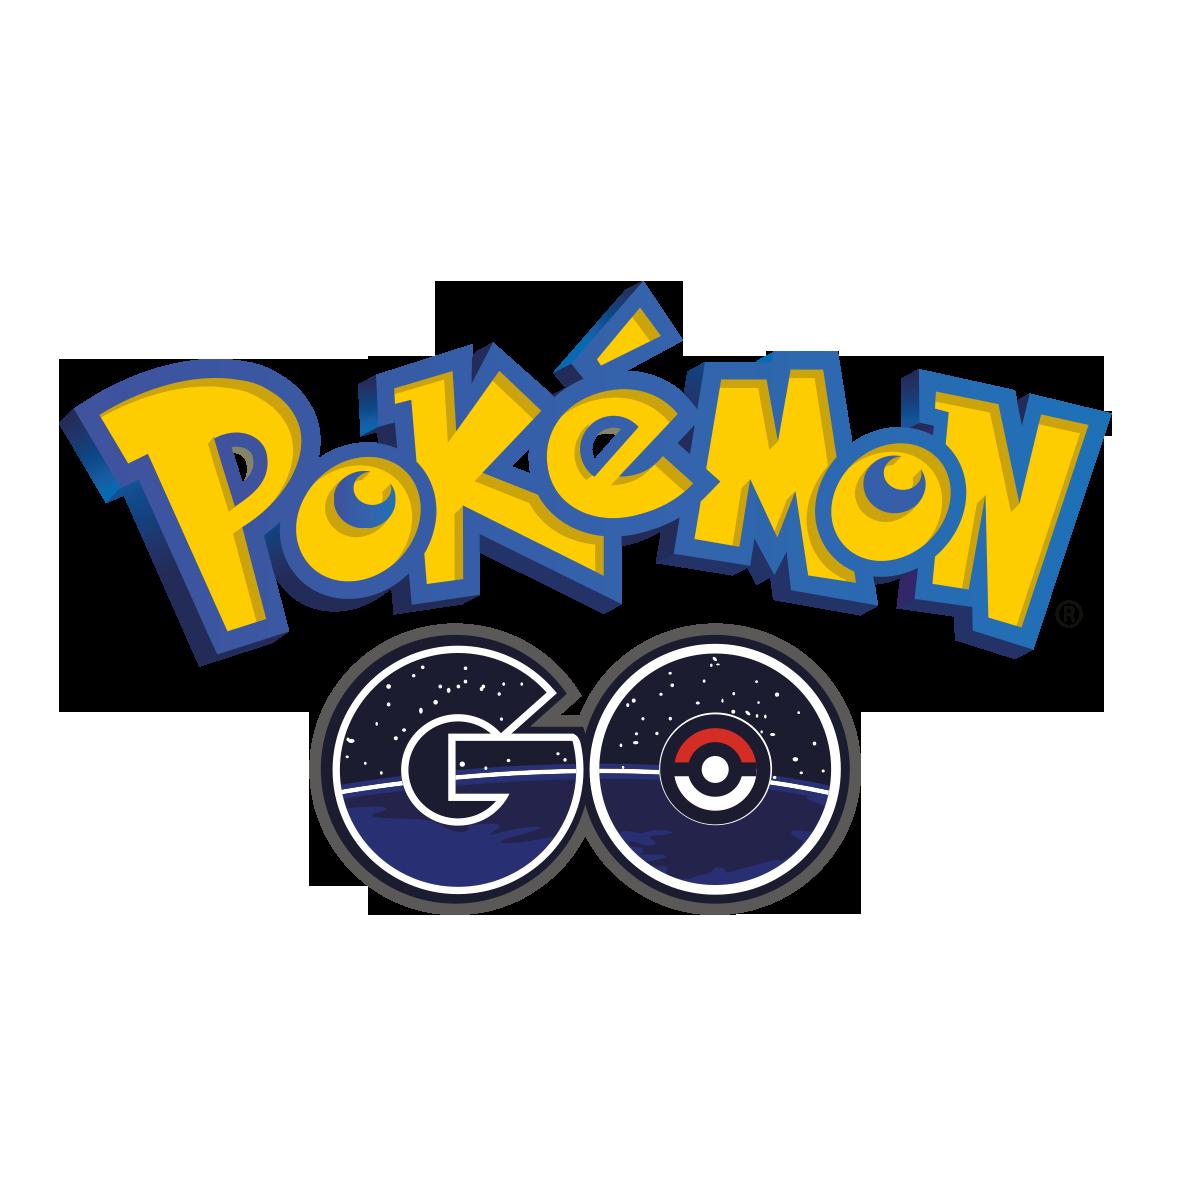 1200x1200 Pokemon Go Logo Vector Png Transparent Pokemon Go Logo Vector.png